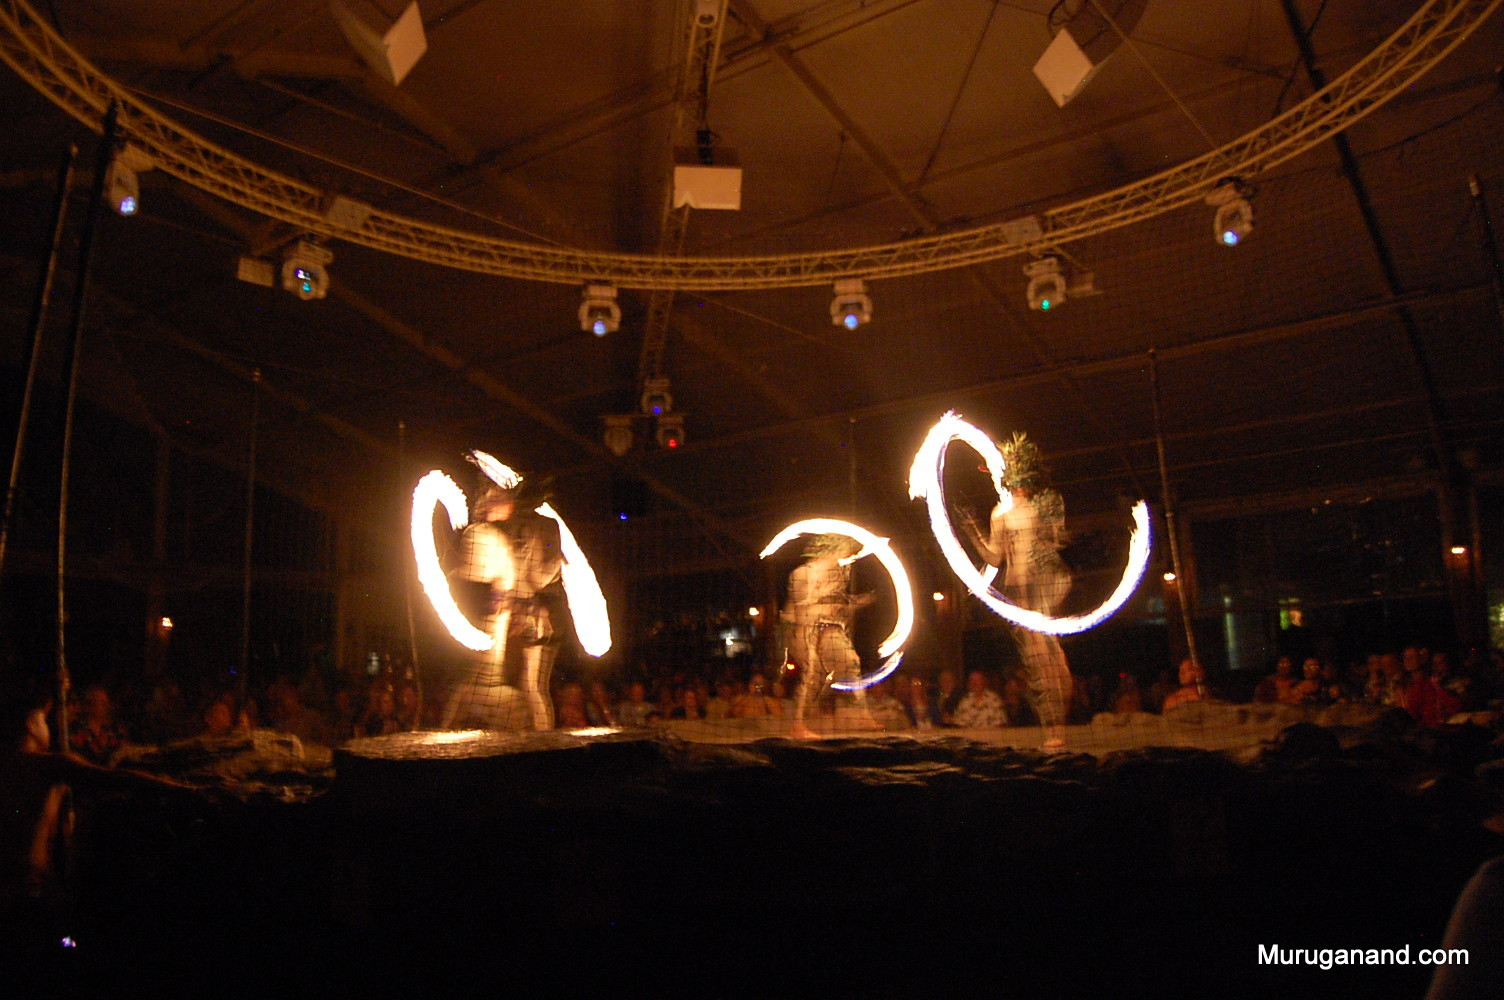 More Fire Dancing (Kauai)